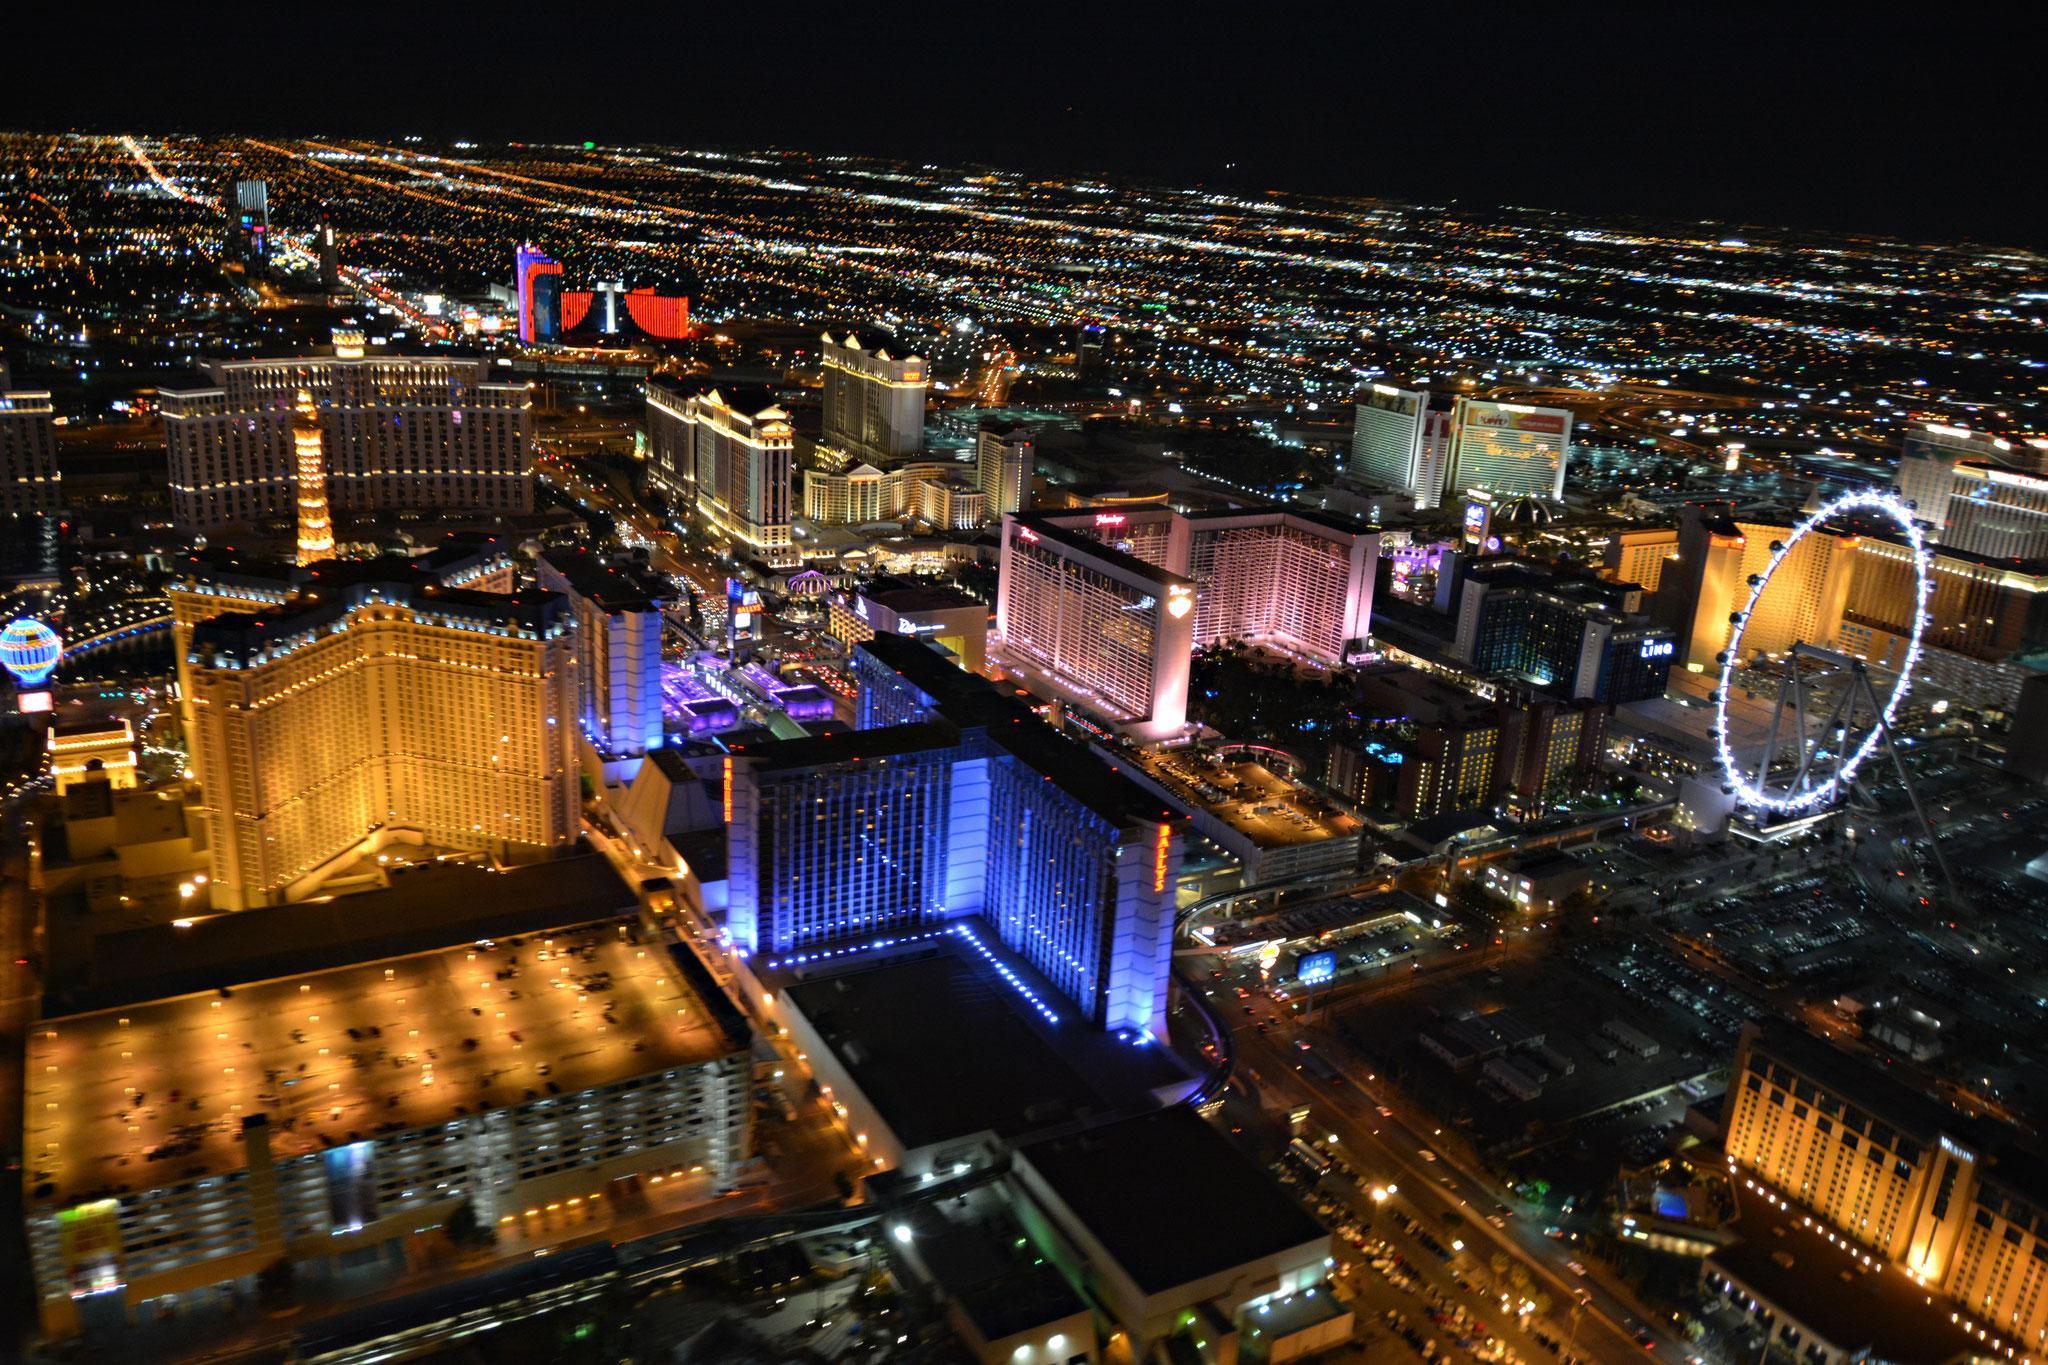 Las Vegas bei Nacht aus der Helikopterperspektive